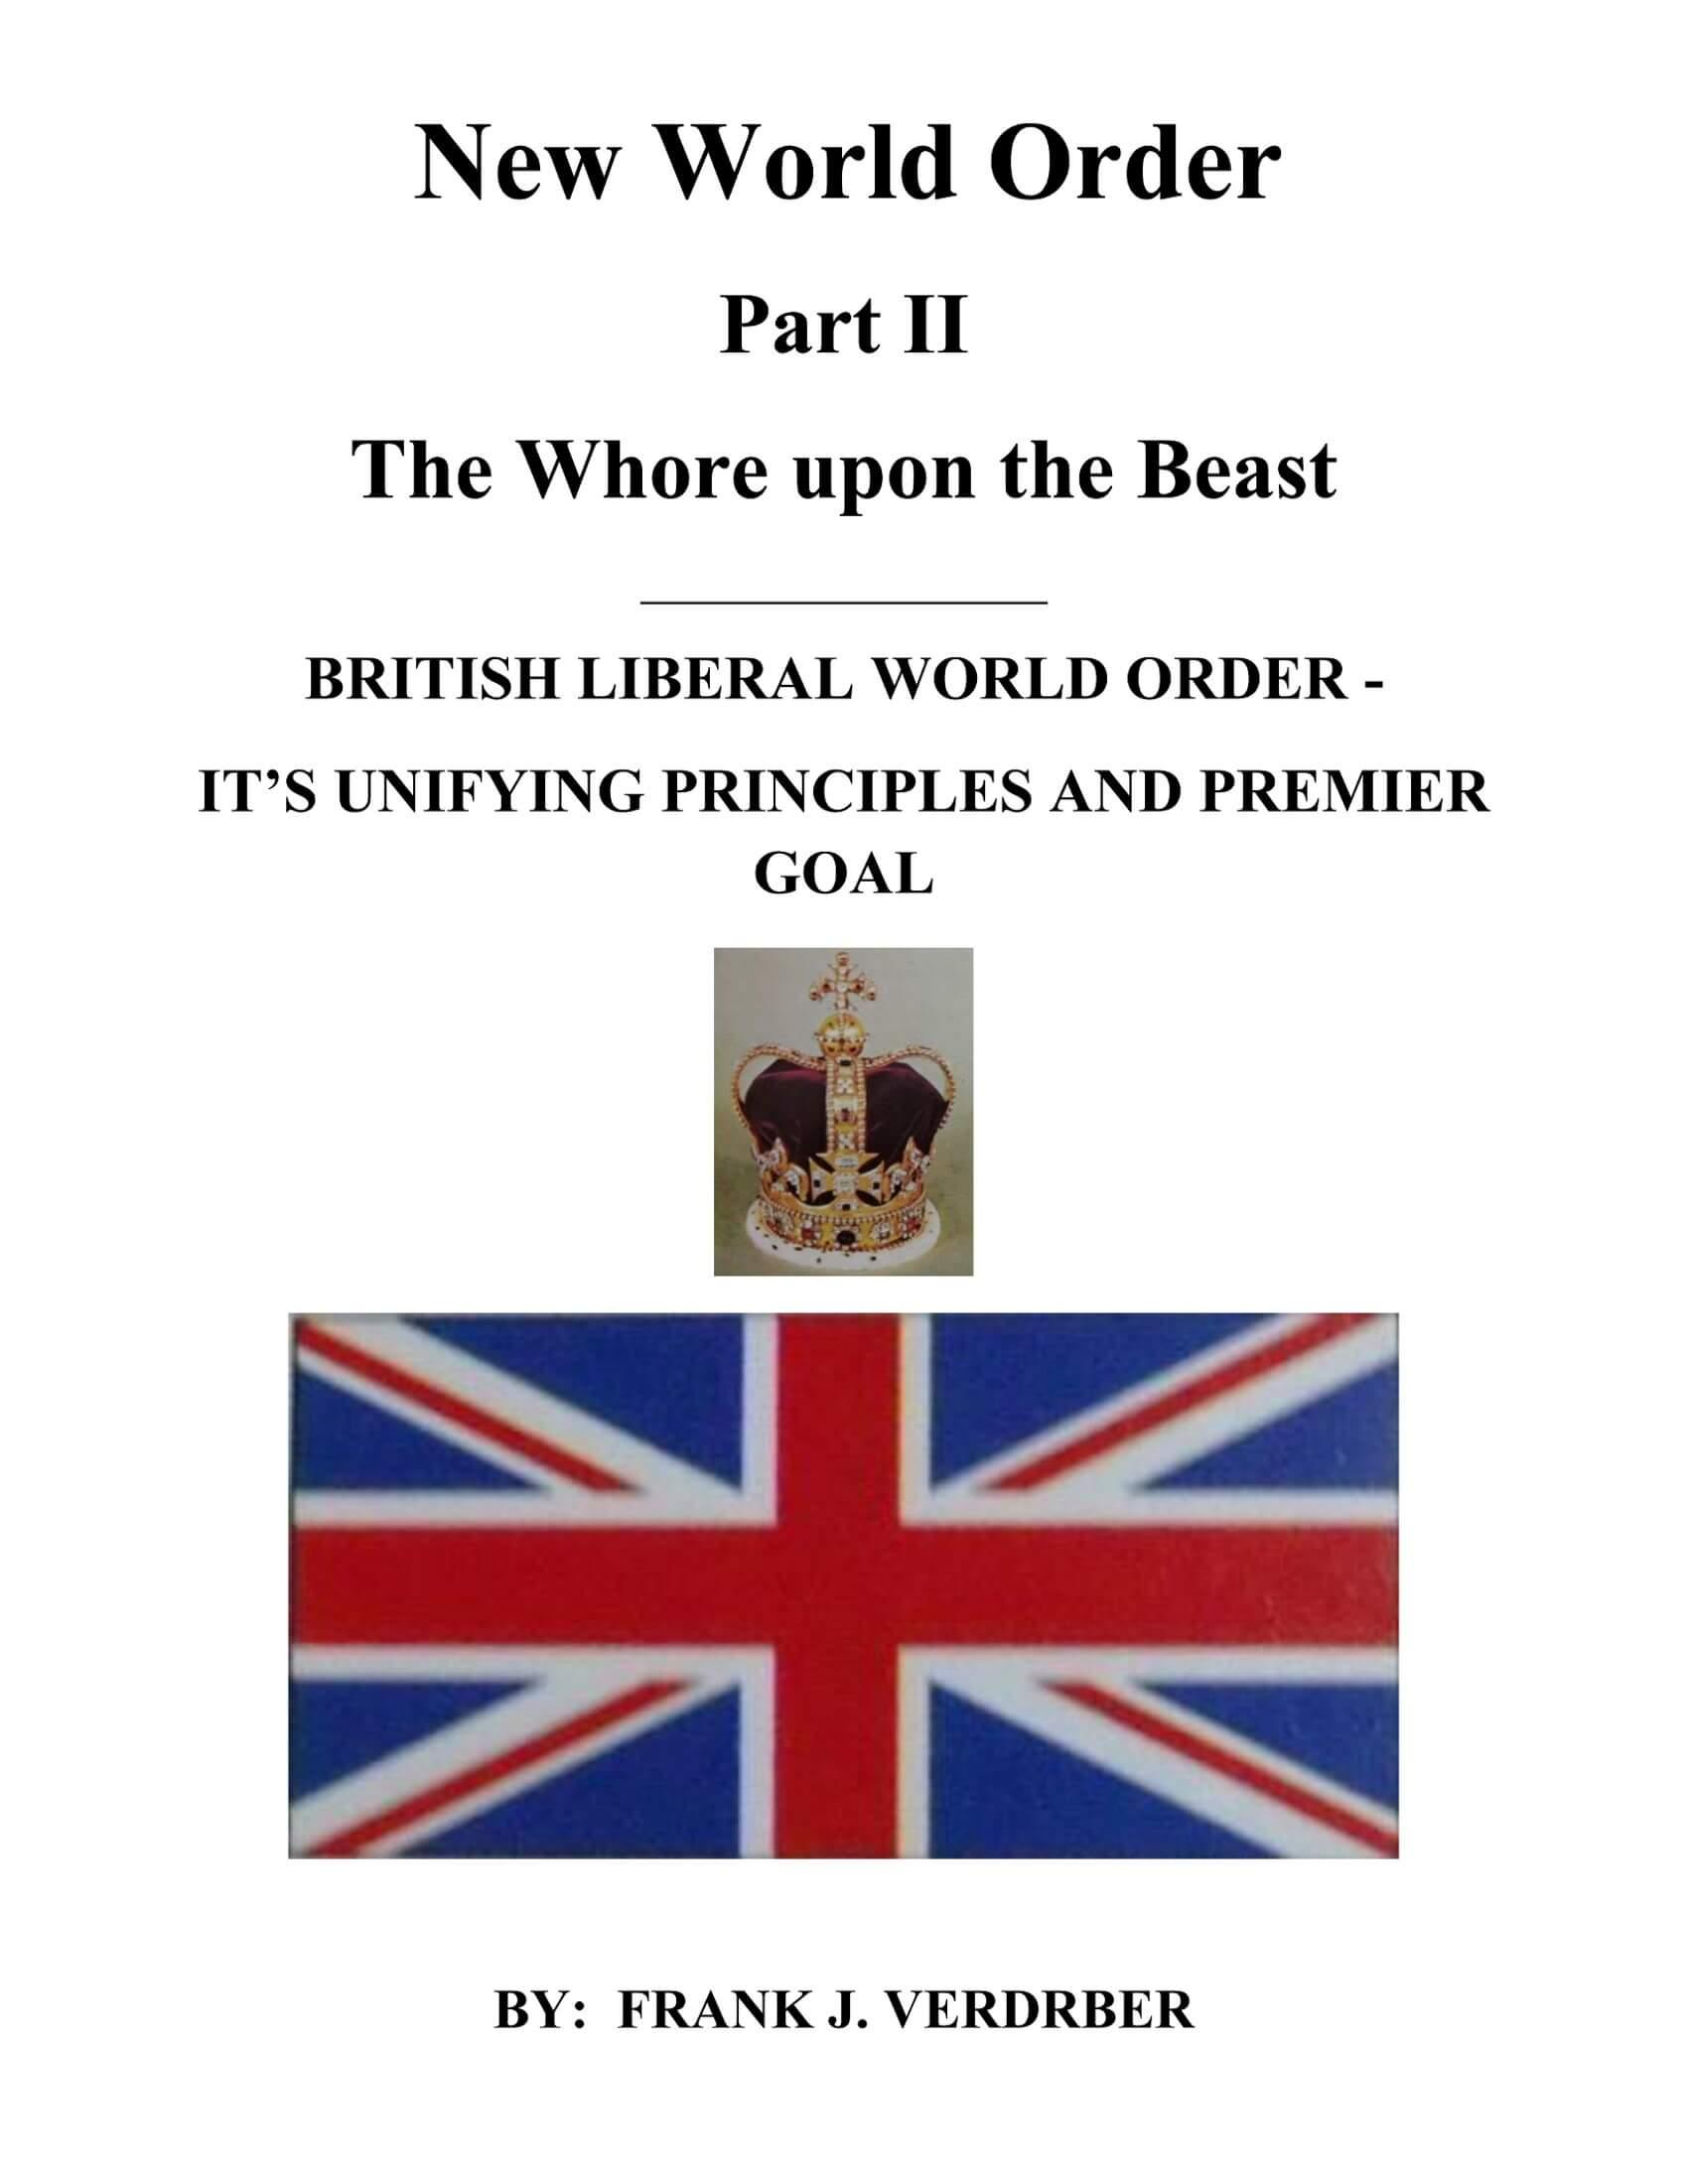 New World Order II